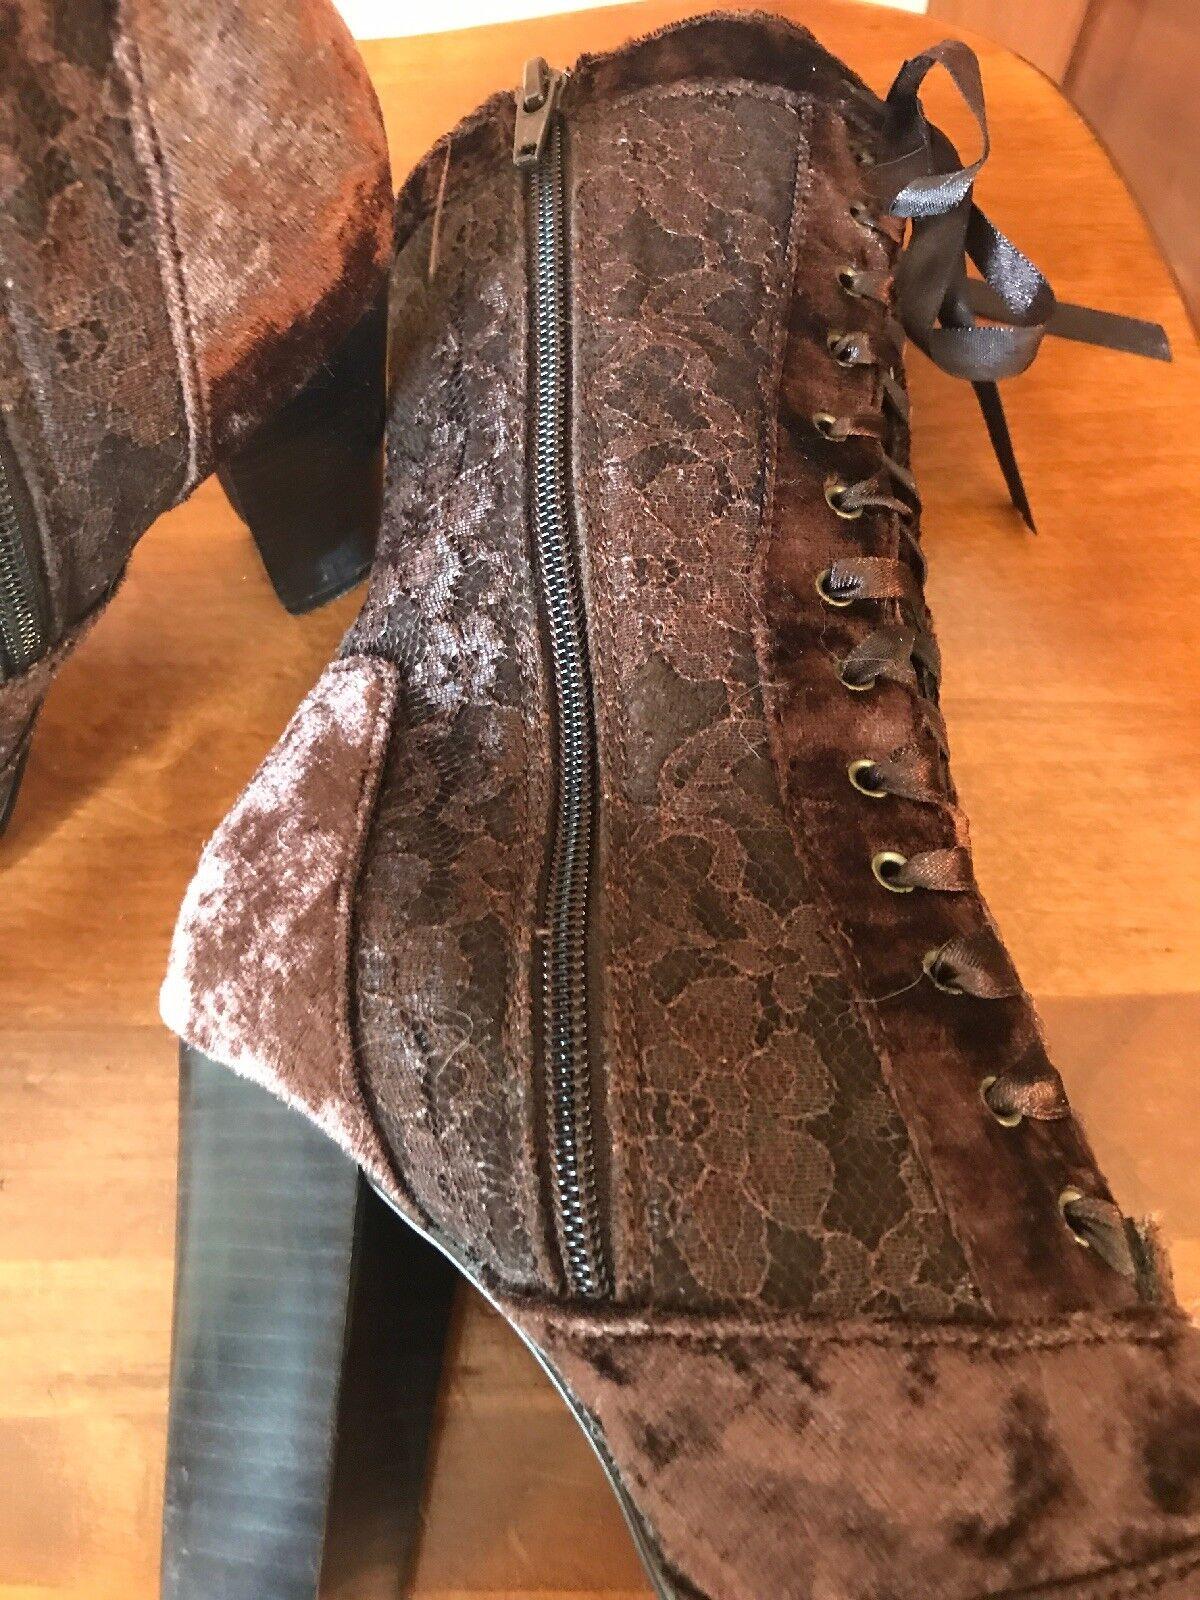 AMANDA SMITH VICTORIAN Stiefel braun VELVET & LACE HIGH HEEL TIE OR ZIP 6.5 M